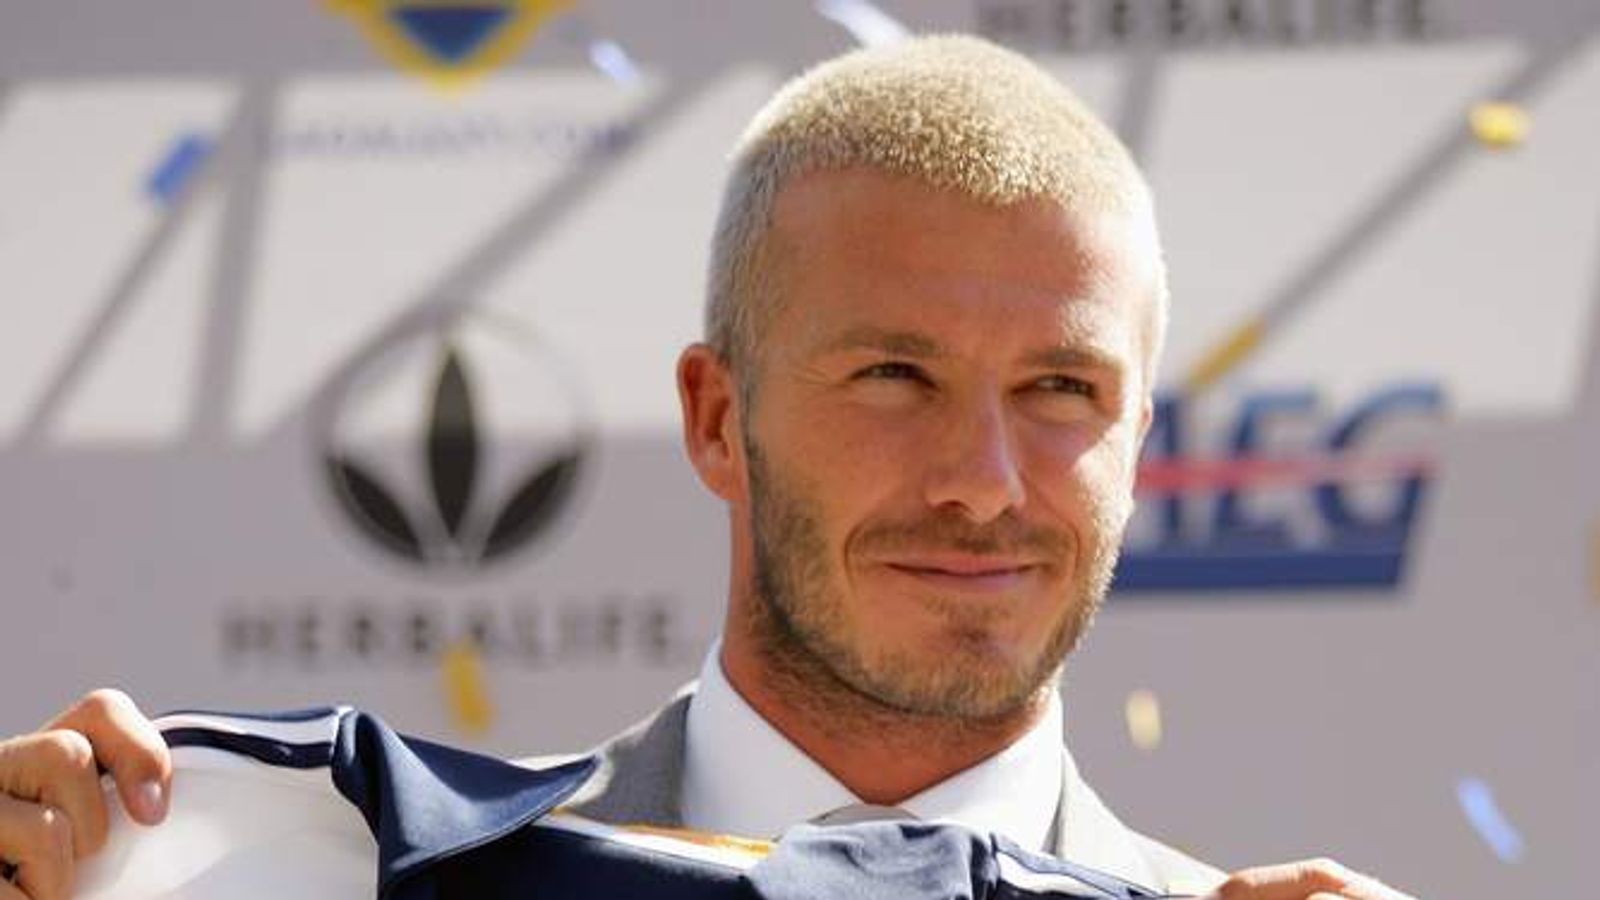 David Beckham Announced As An LA Galaxy Player